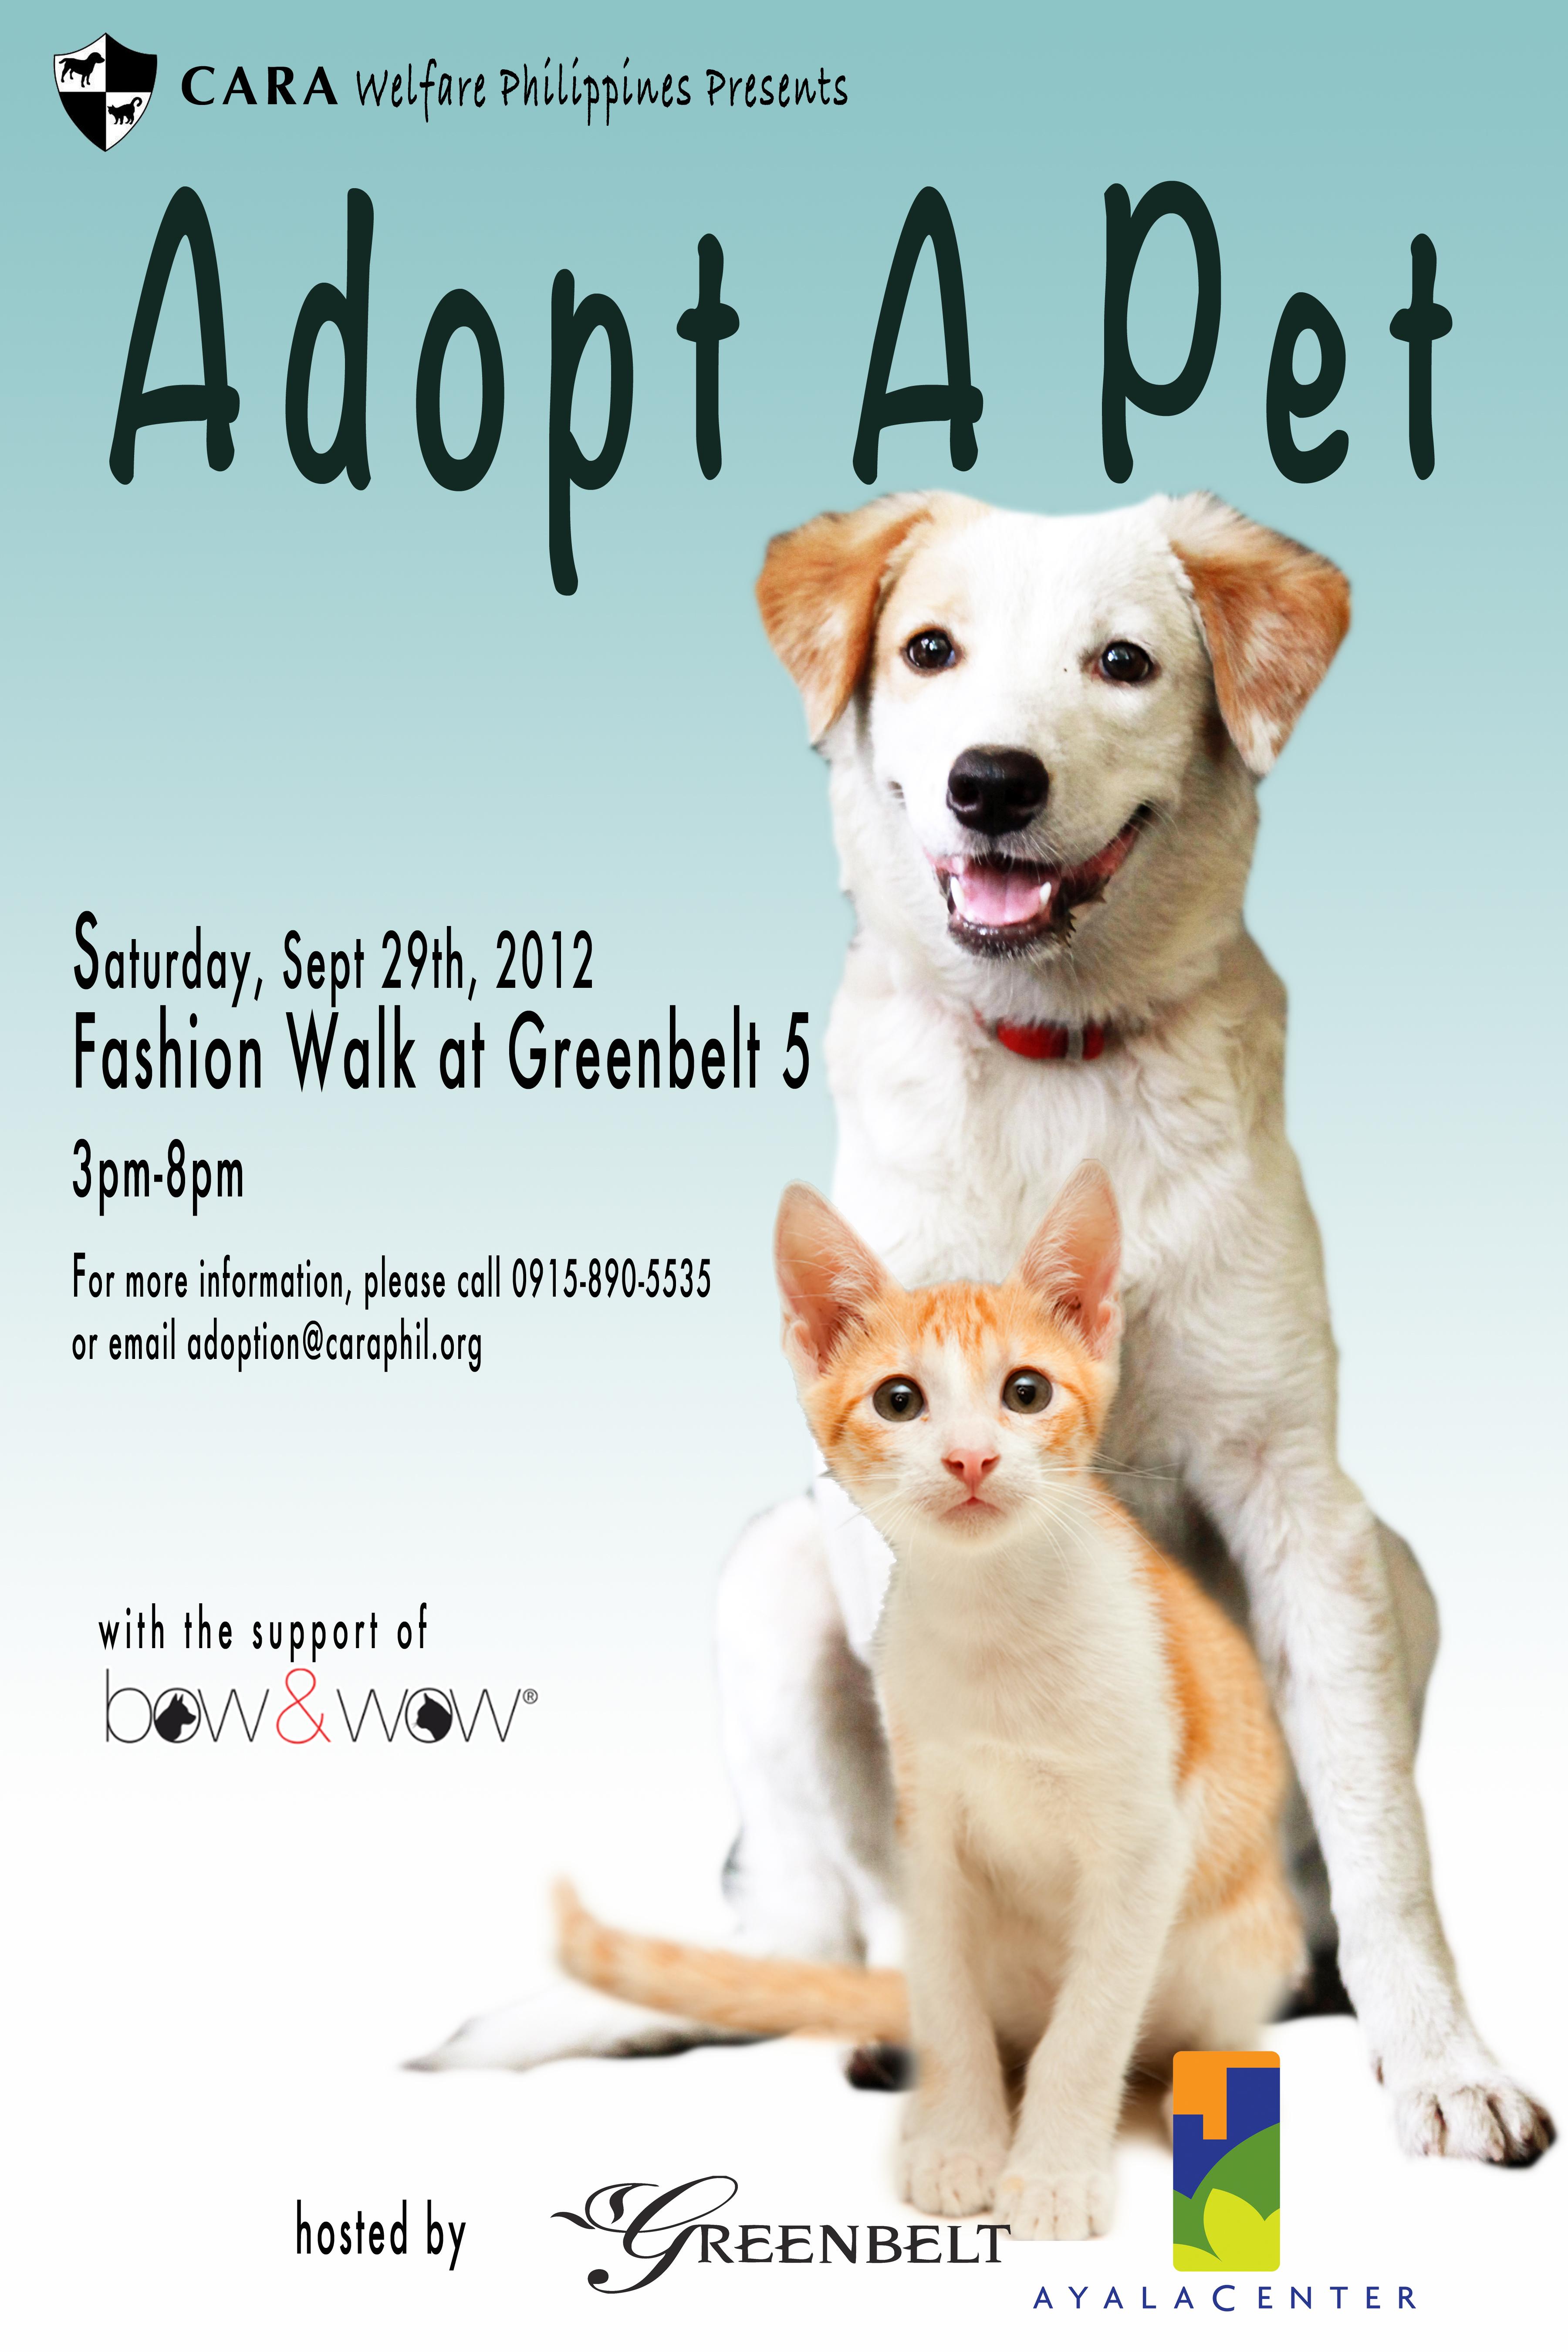 Adoption Event at Greenbelt 5!!!